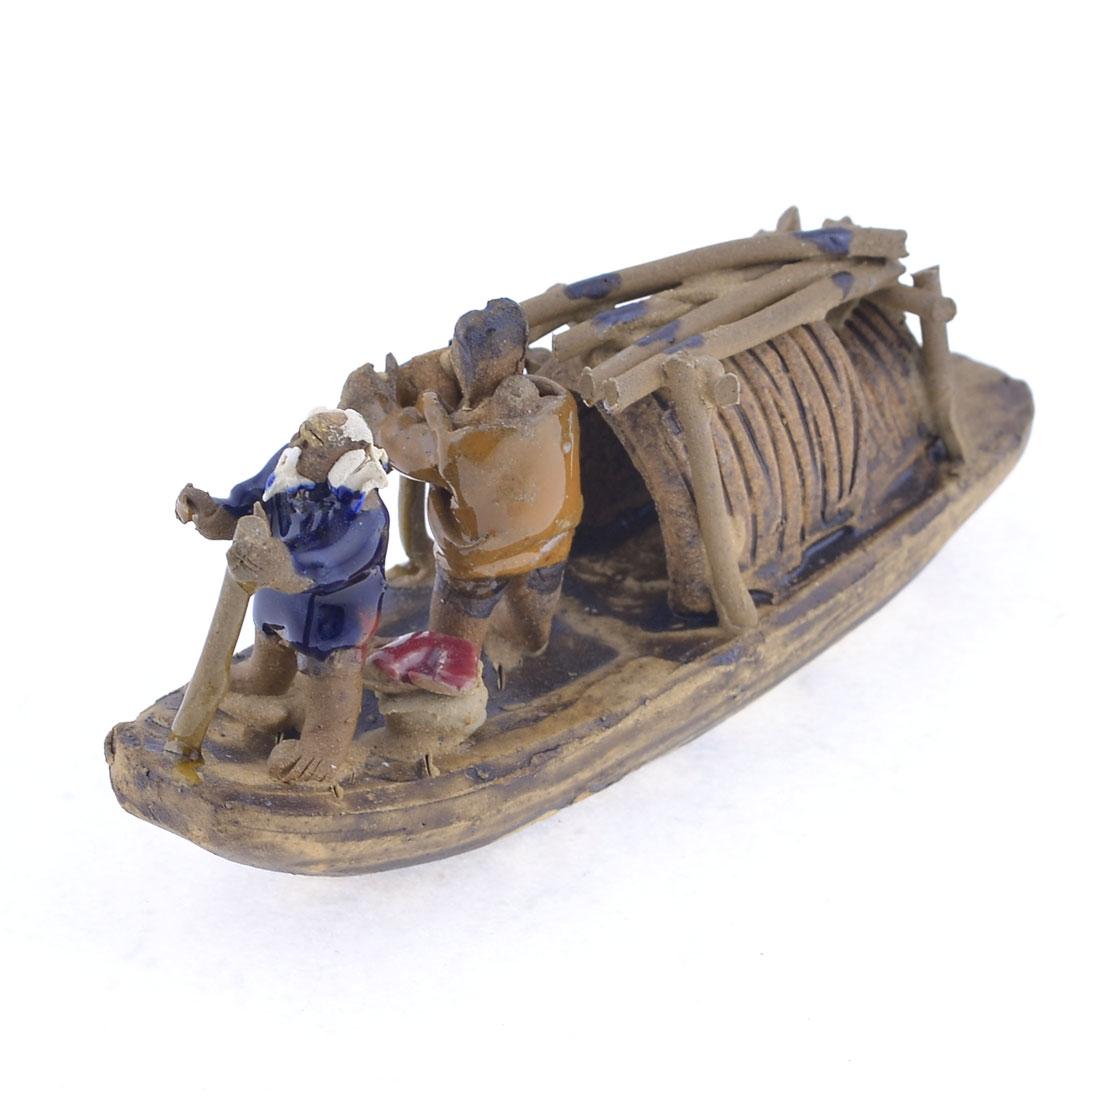 Handmade Lacunal Base 12.5cm Long Couple Fishman Ceramic Craft Boat Ship